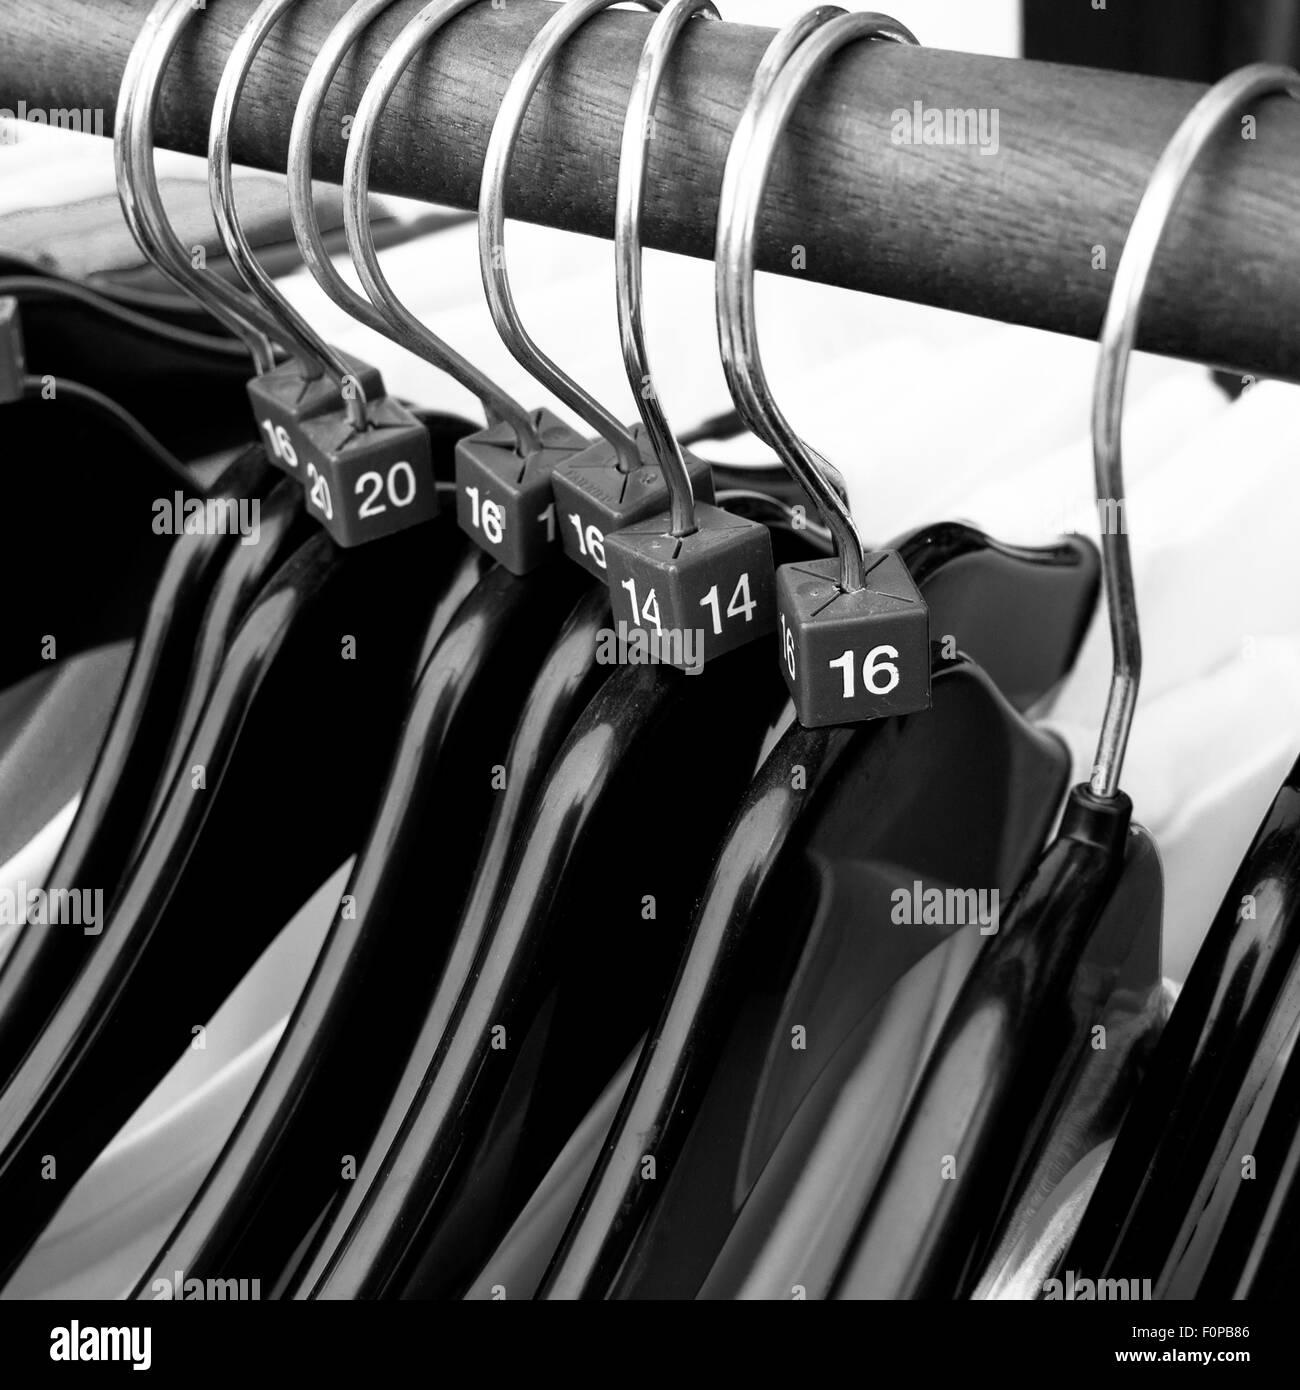 Women`s clothes sizes on coat hangers - Stock Image